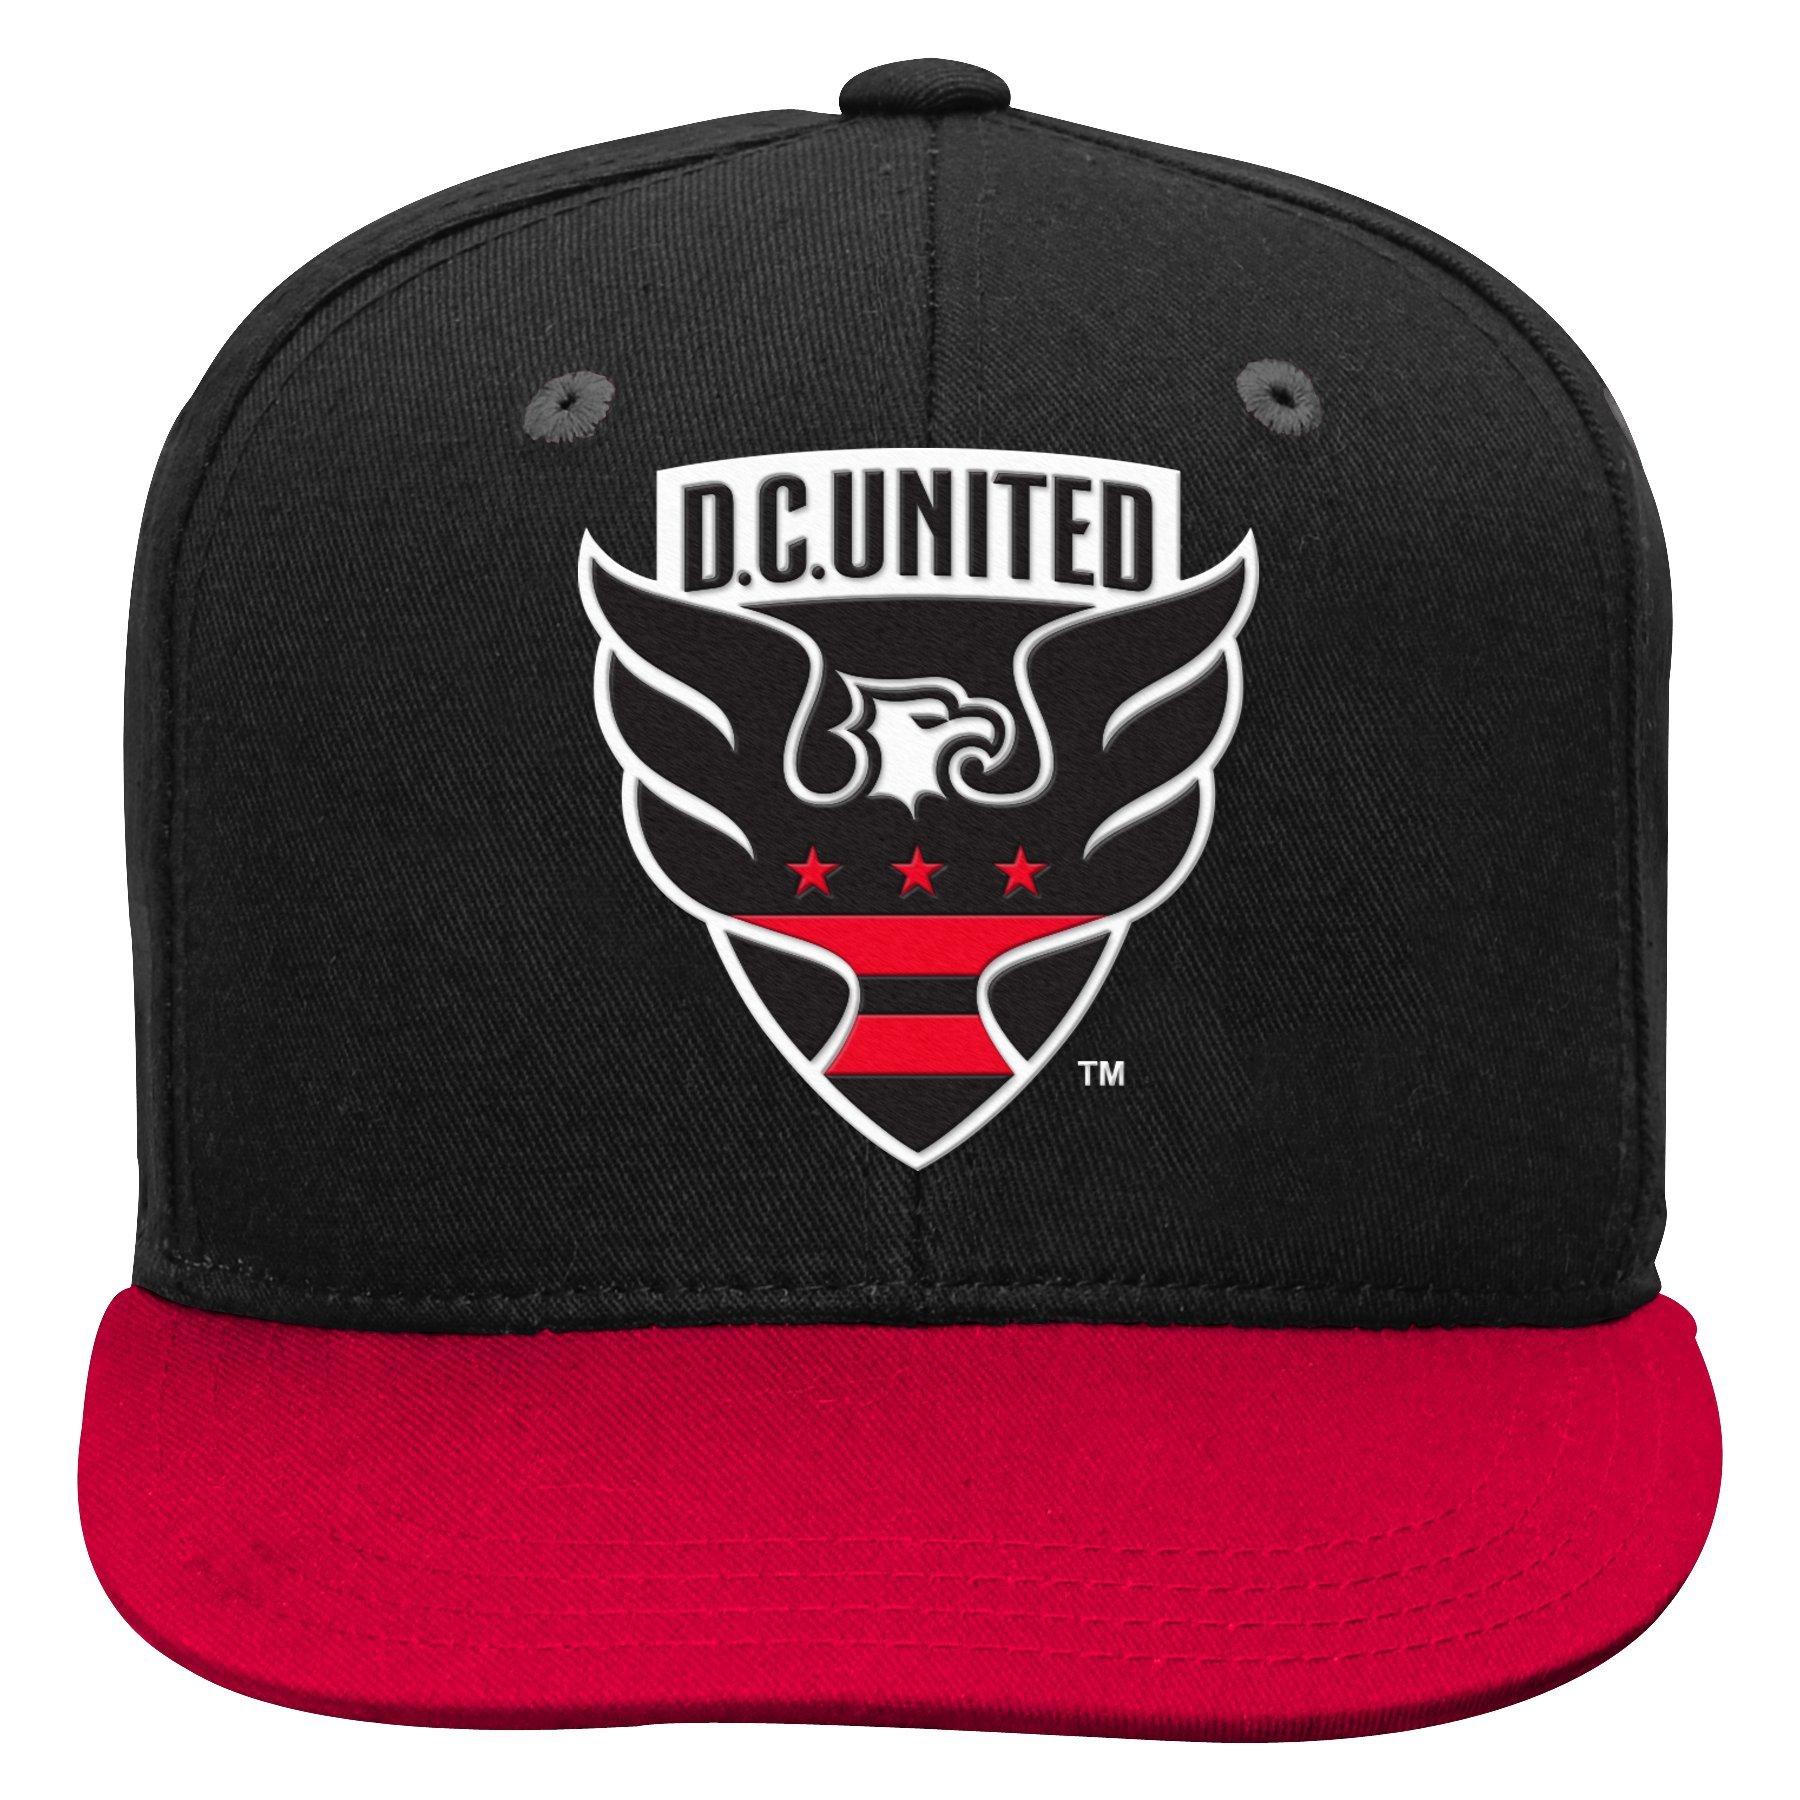 Outerstuff MLS D.C. United Boys Flat Visor Snapback, Black, One Size